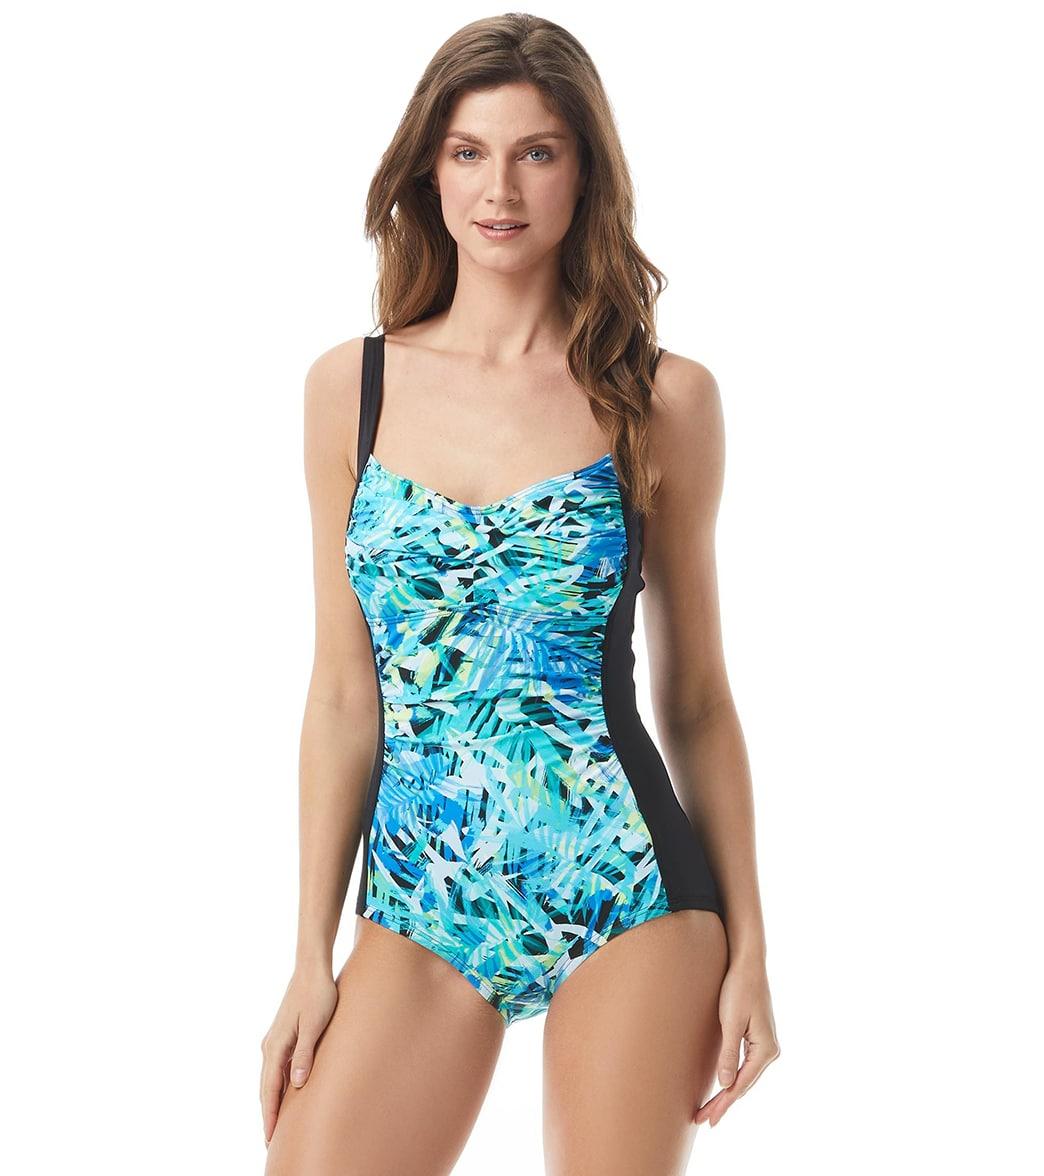 Gabar Chlorine Resistant Palm Spray Twist Bra One Piece Swimsuit